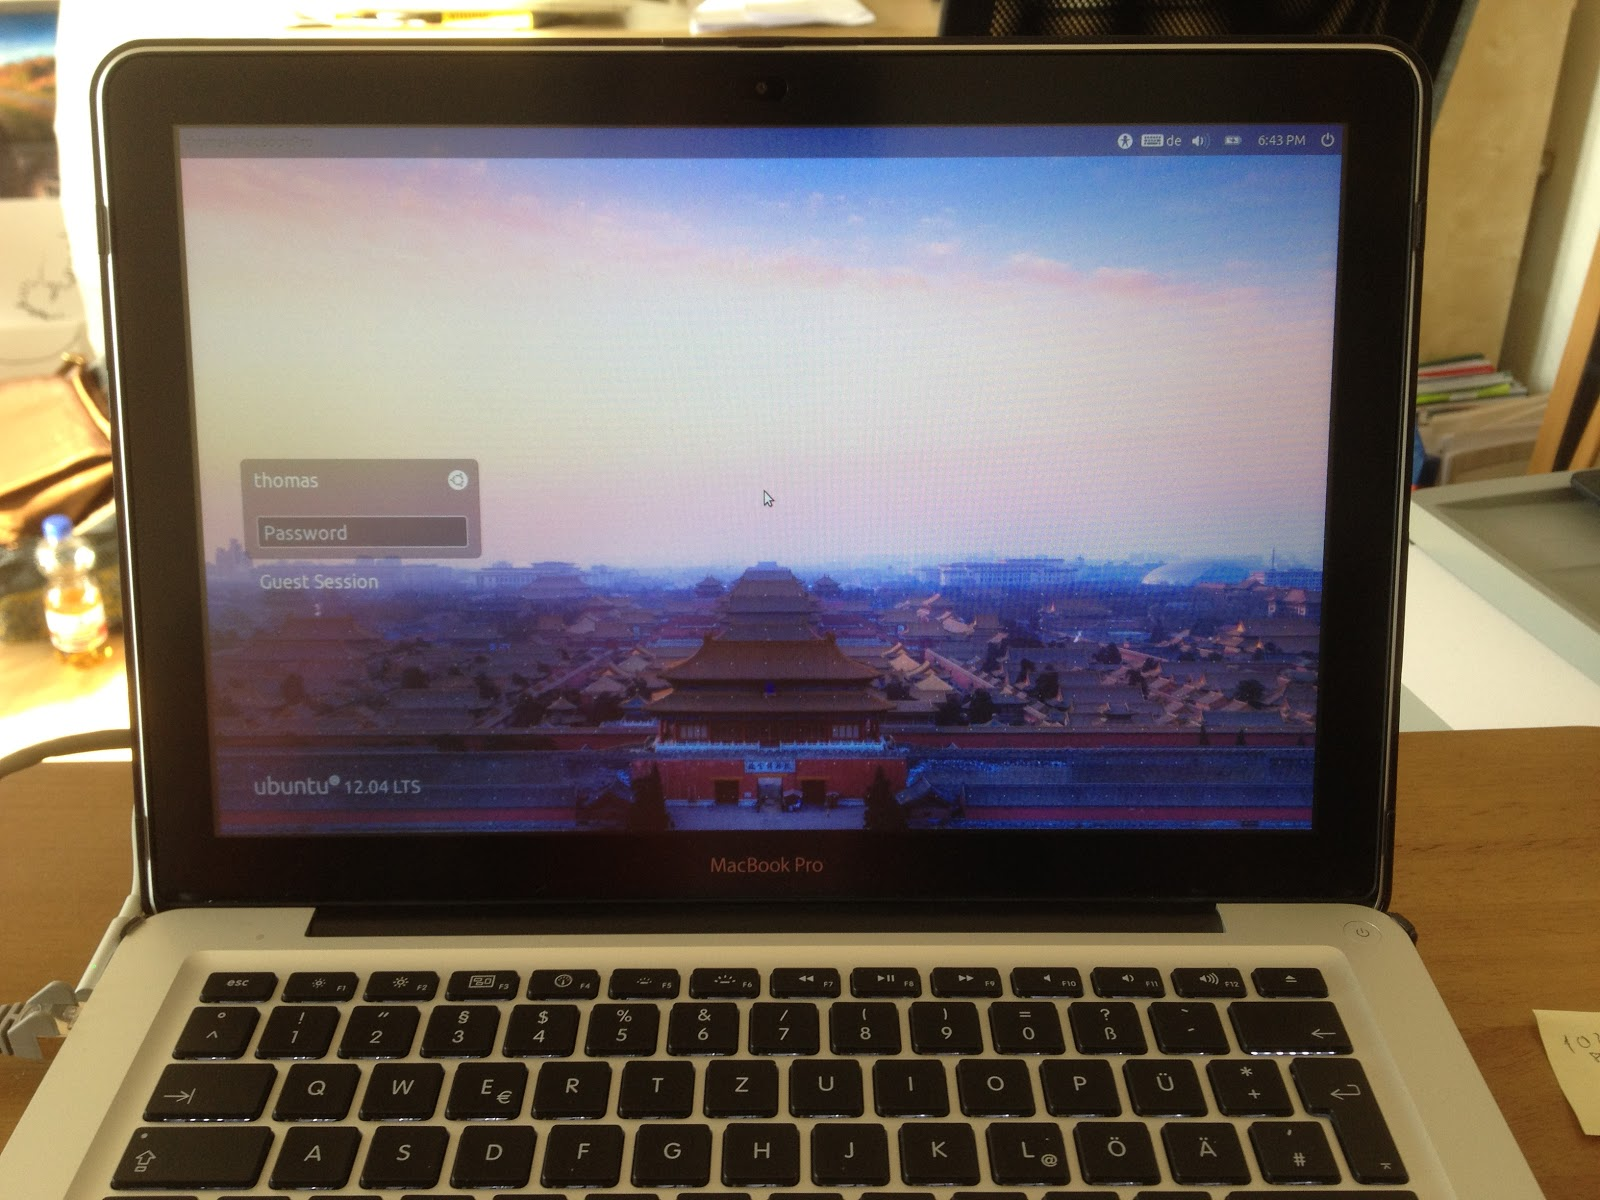 Install Ubuntu On Mac Mini 2012 Ssd Compatibility